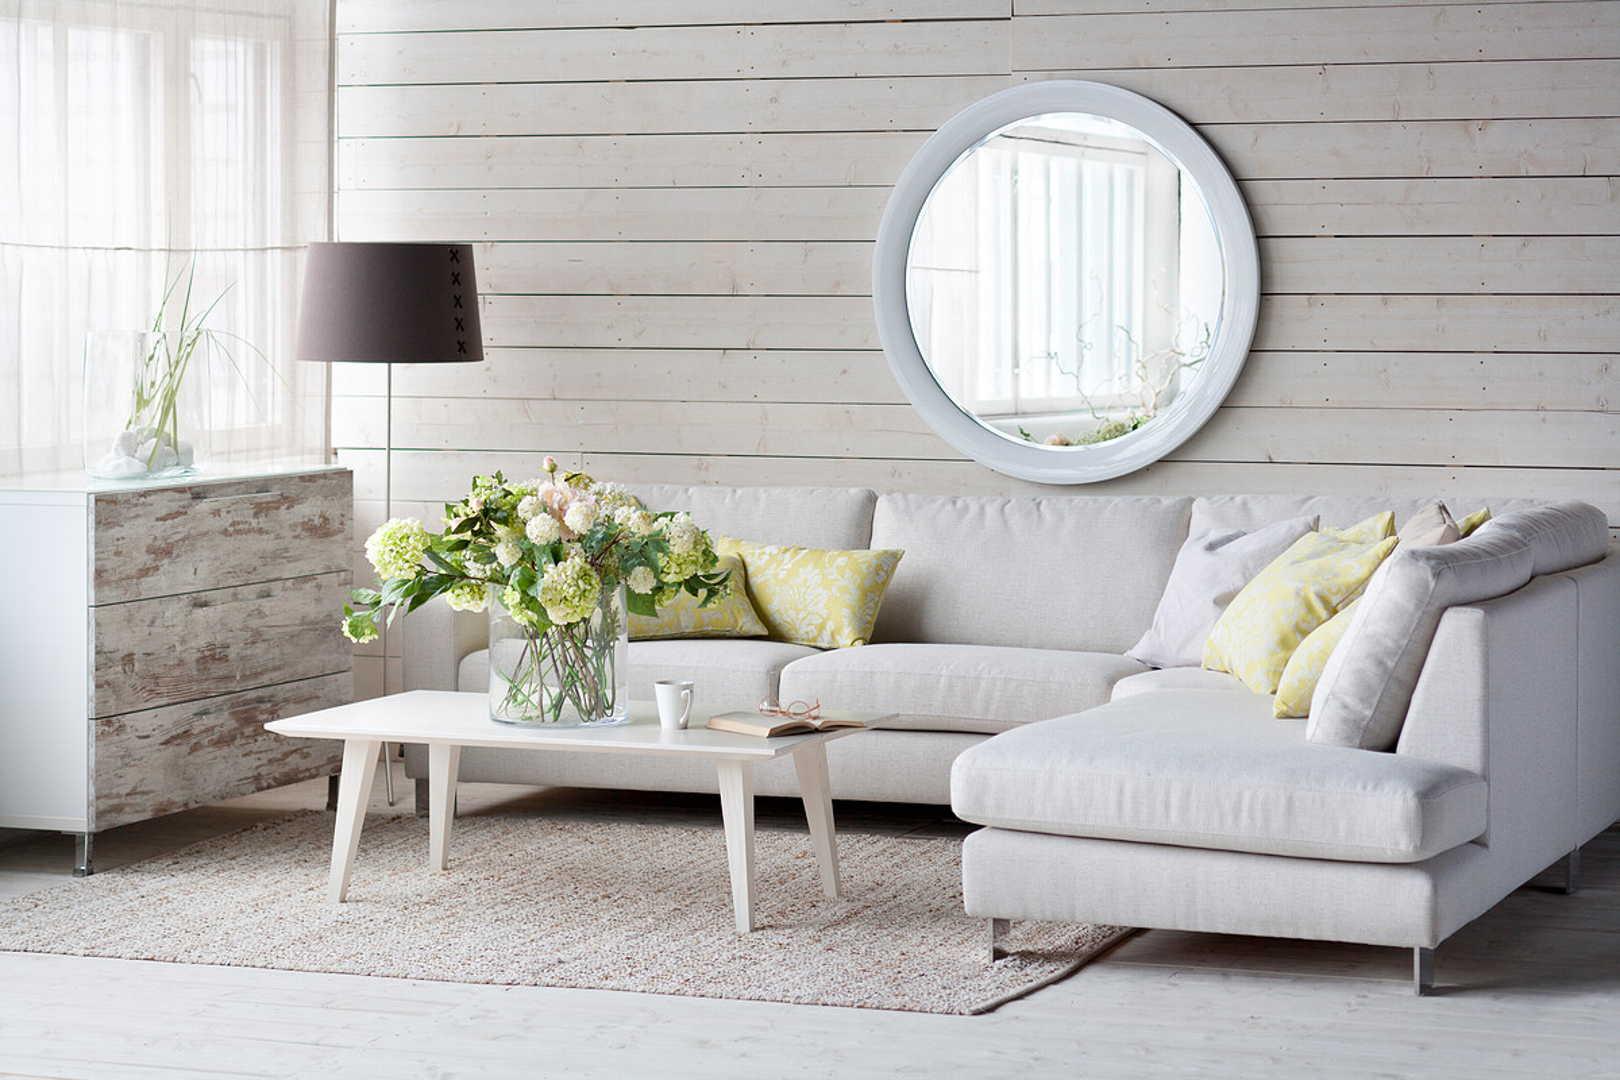 isku, olohuone, hortensiakimppu